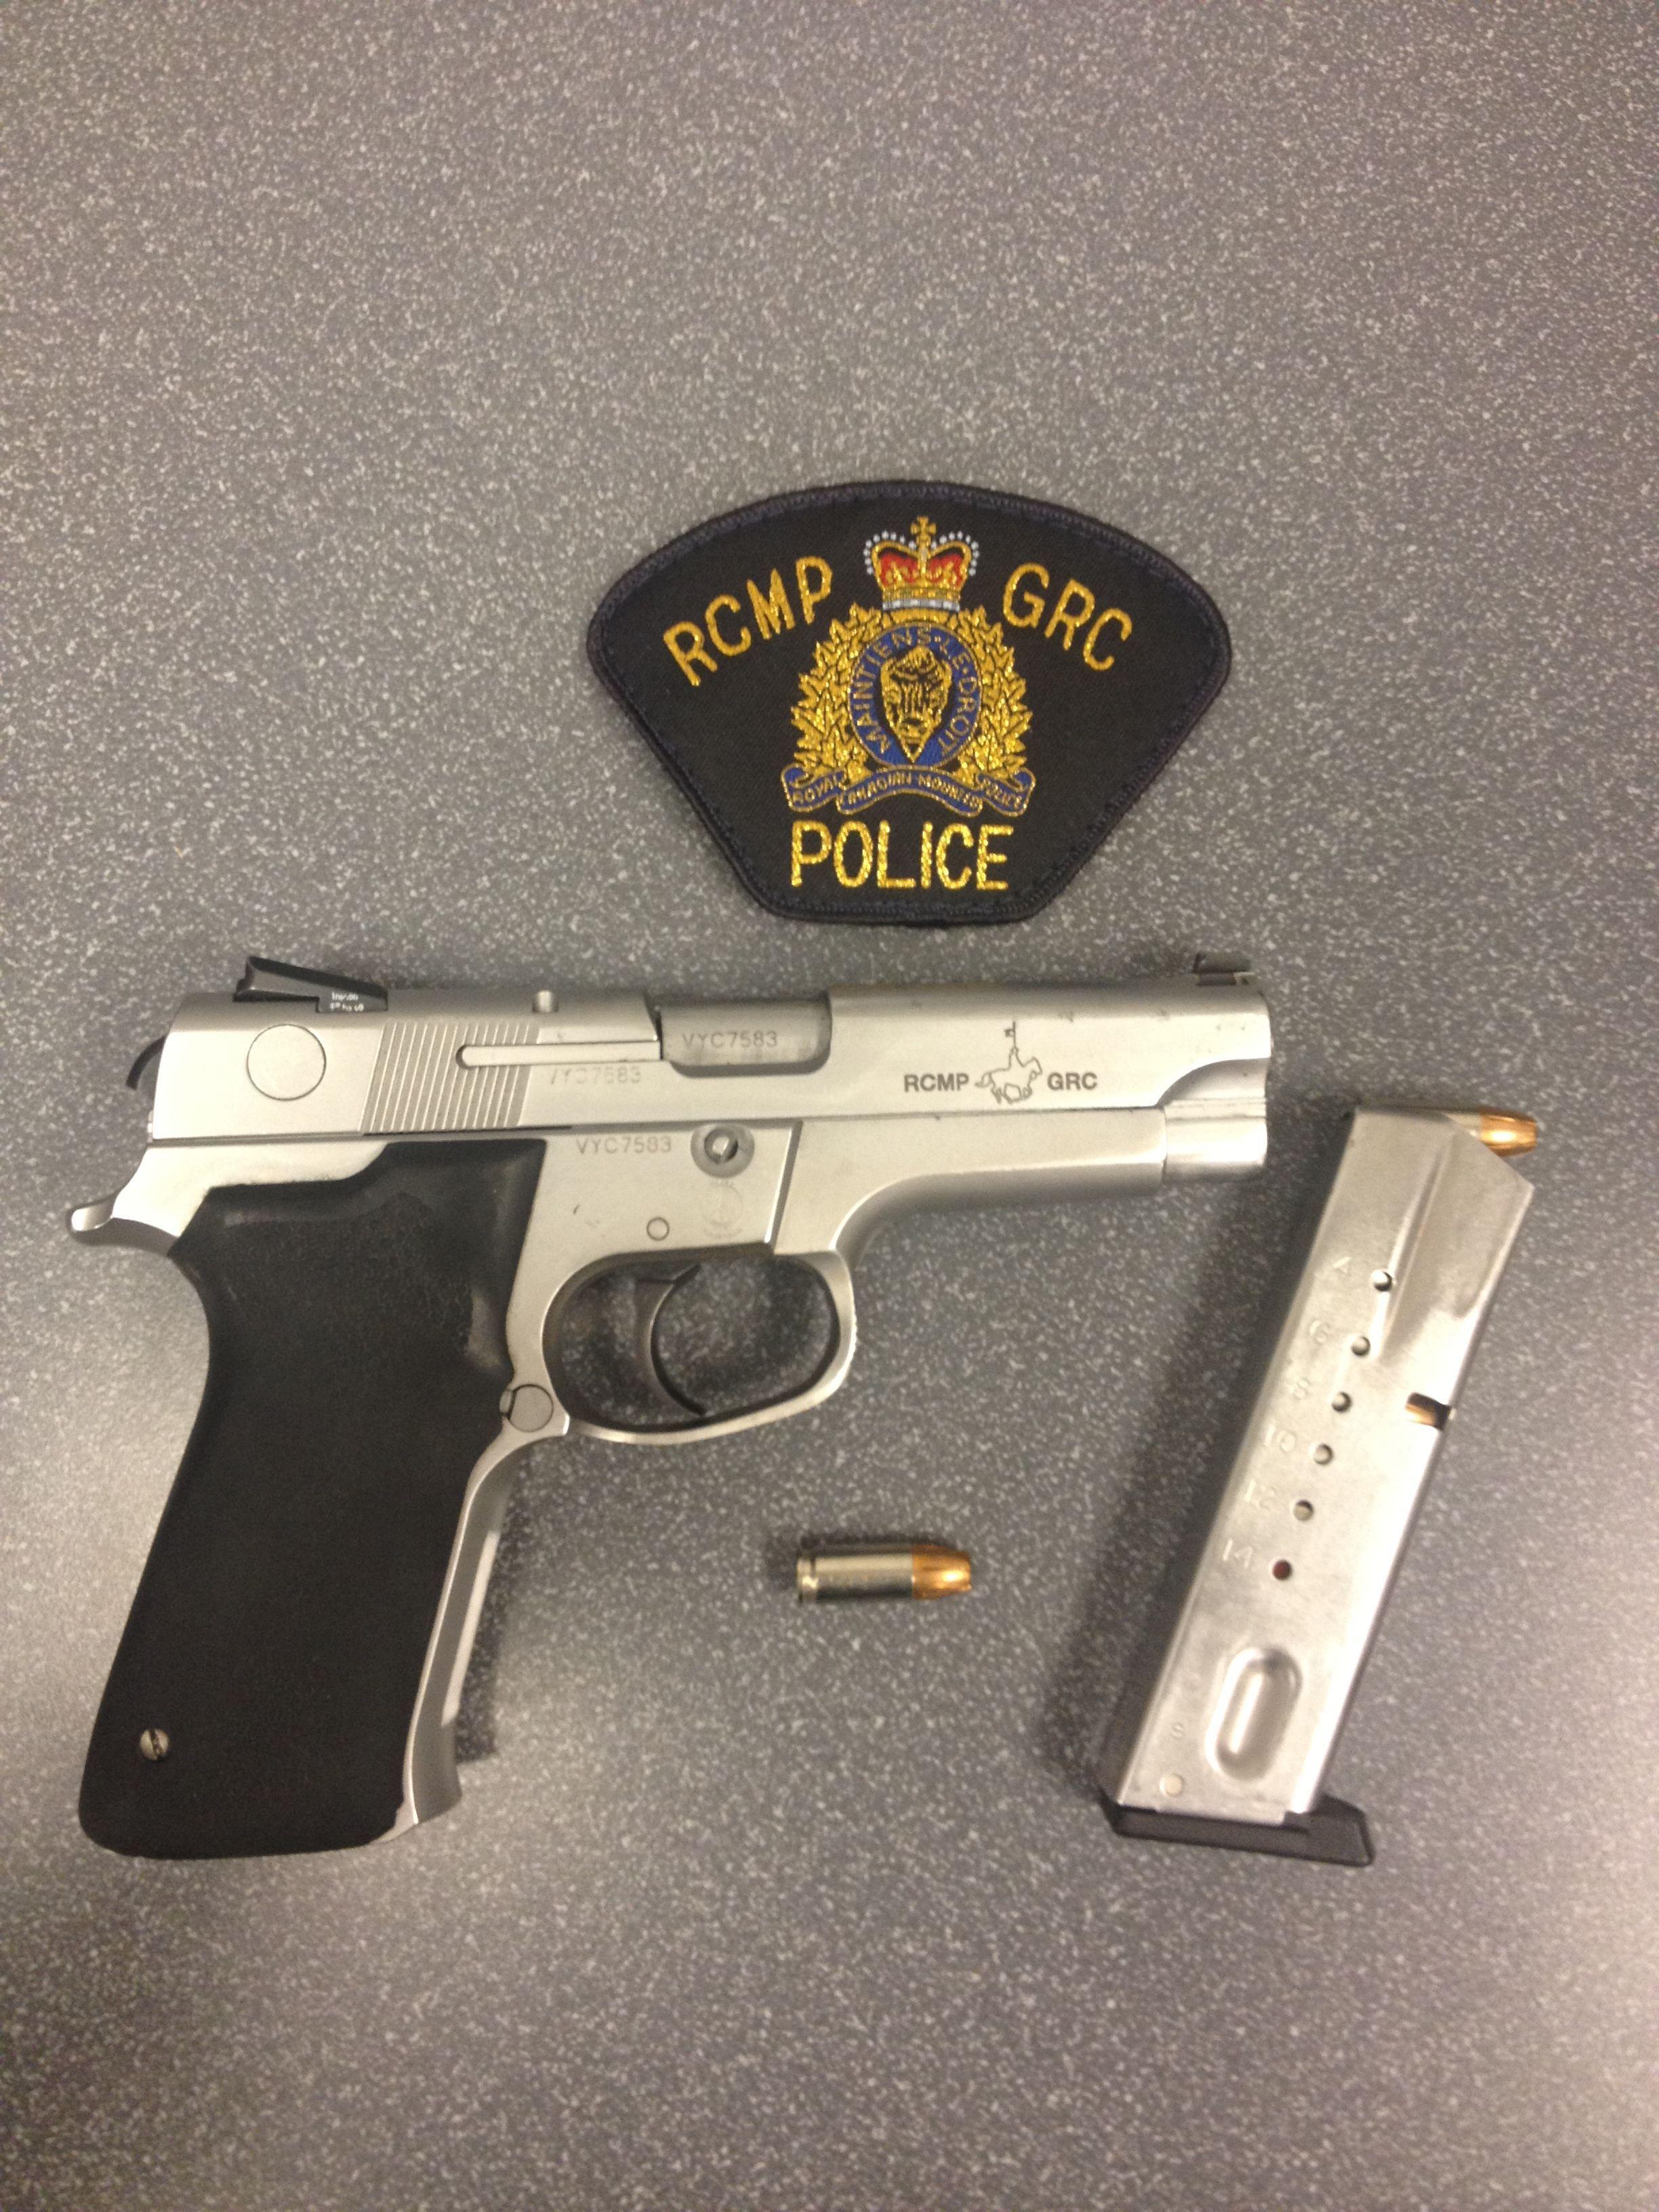 Smith & Wesson 5946, 9mm/15 Rd Pistol | for JonPaul | Guns, Smith